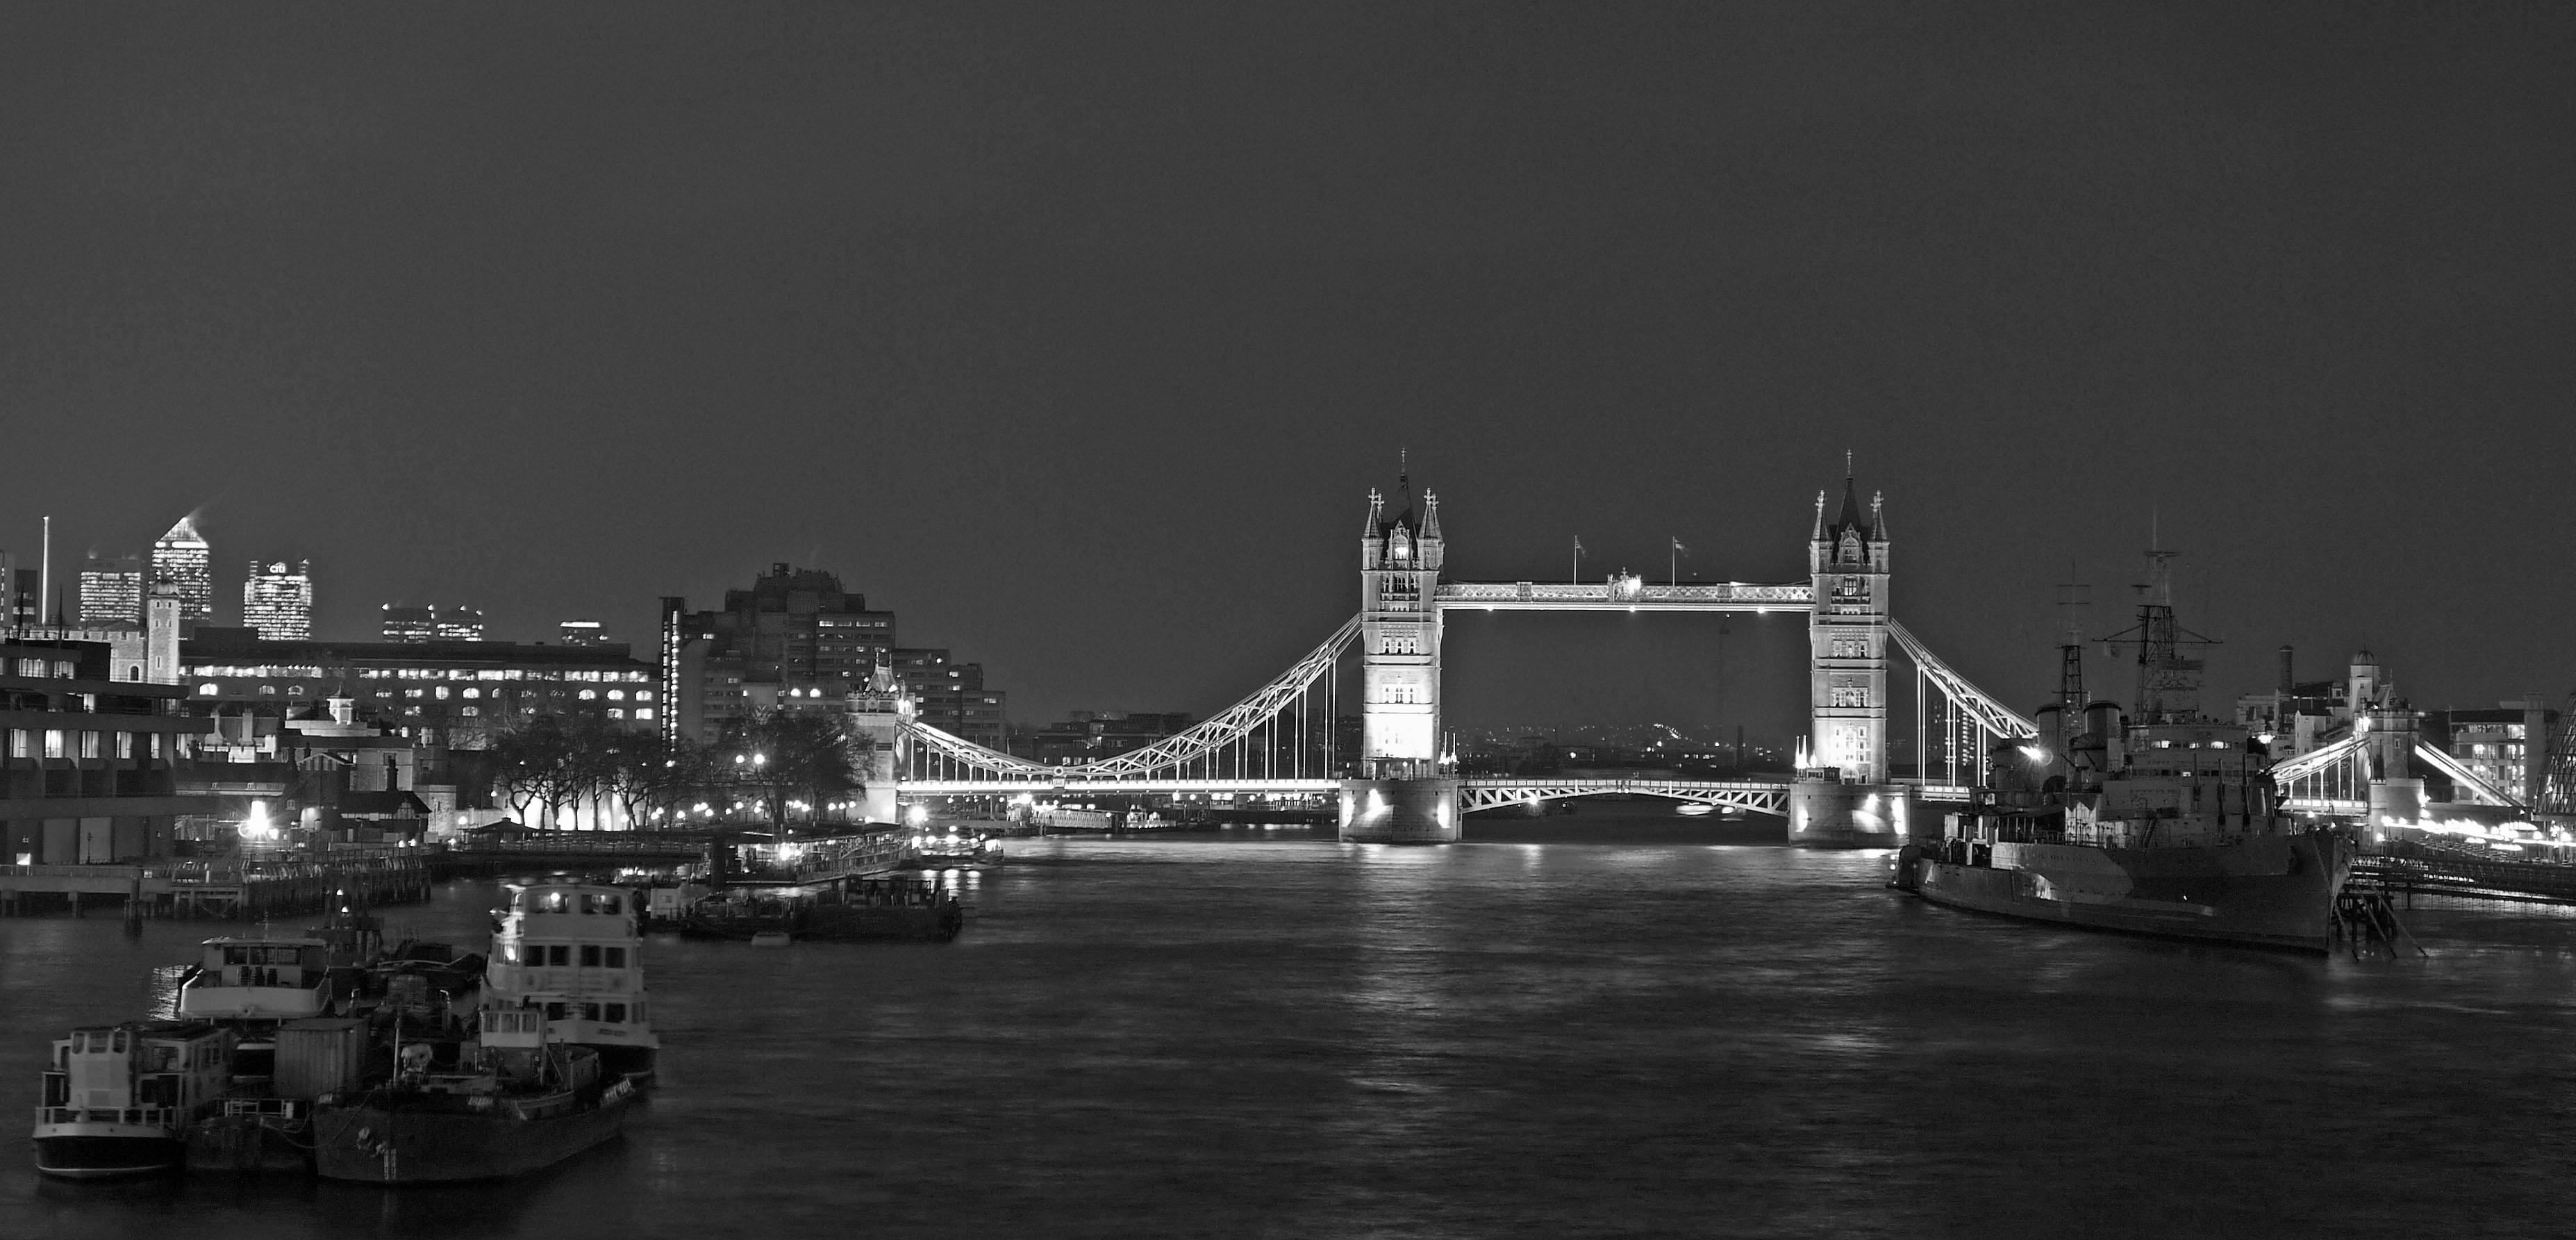 London skyline in black & white | Flickr - Photo Sharing!  London Skyline Black And White